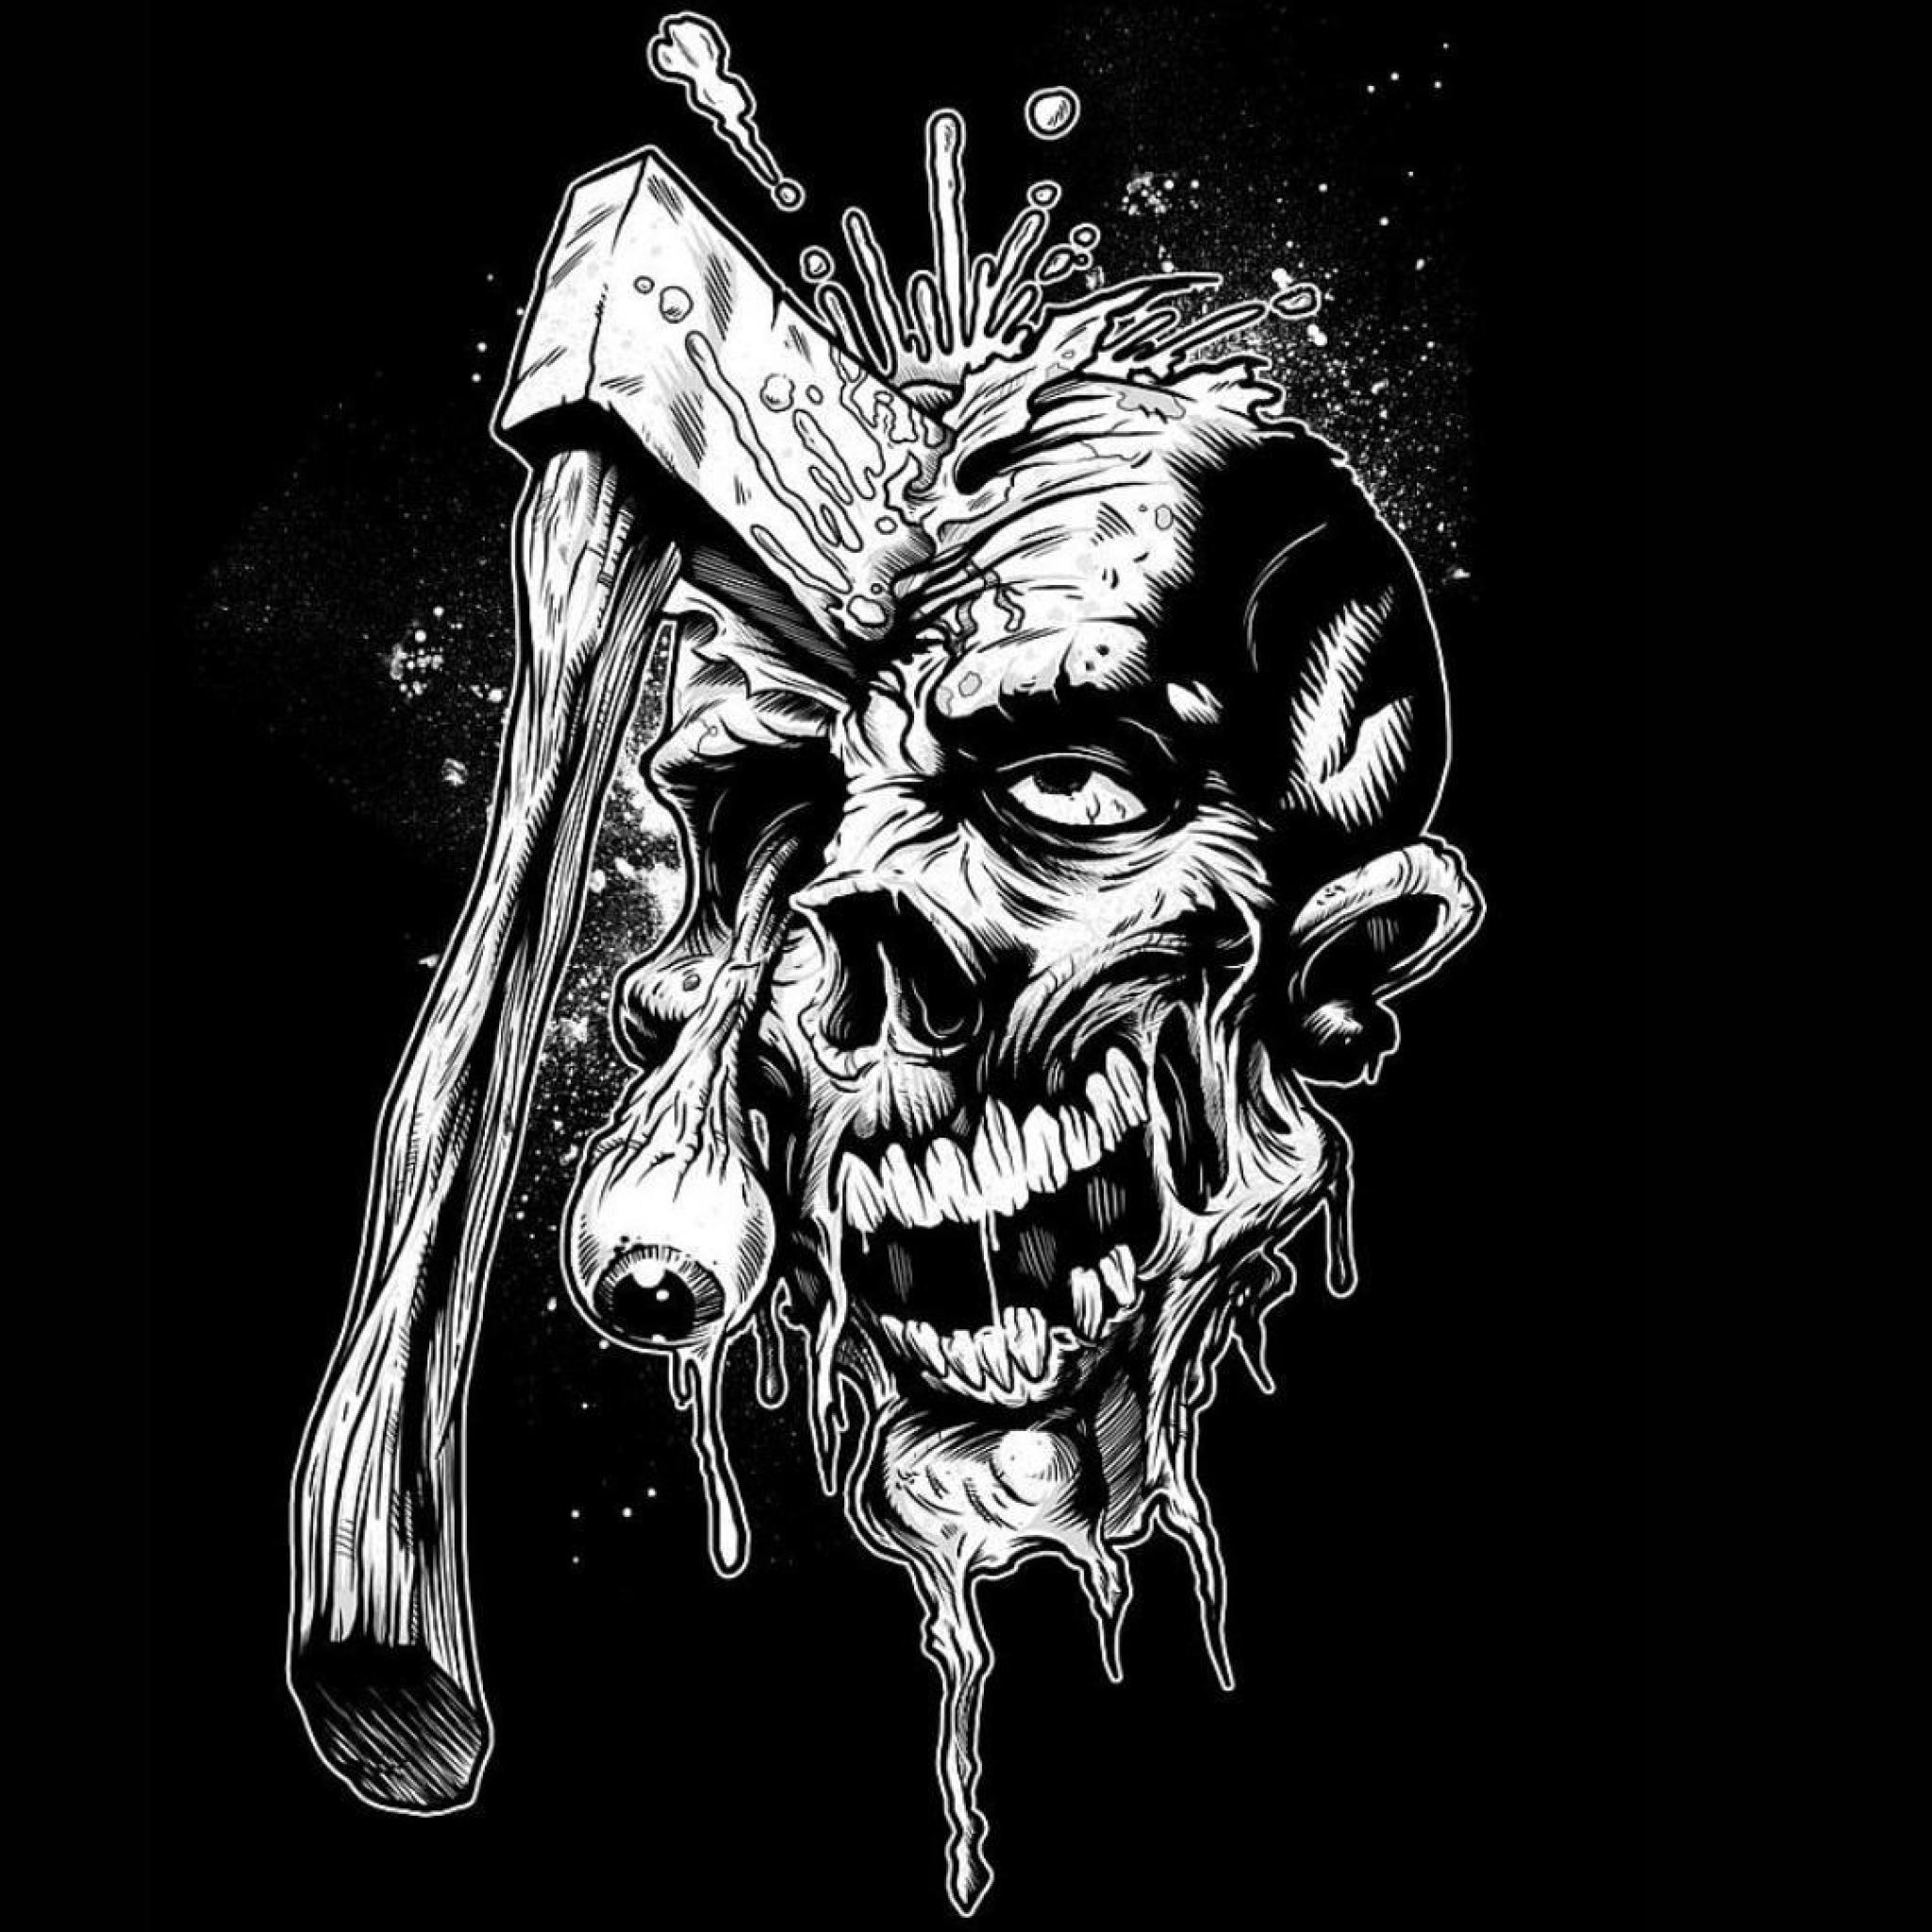 Drawn wallpaper zombie Air  4 New 3